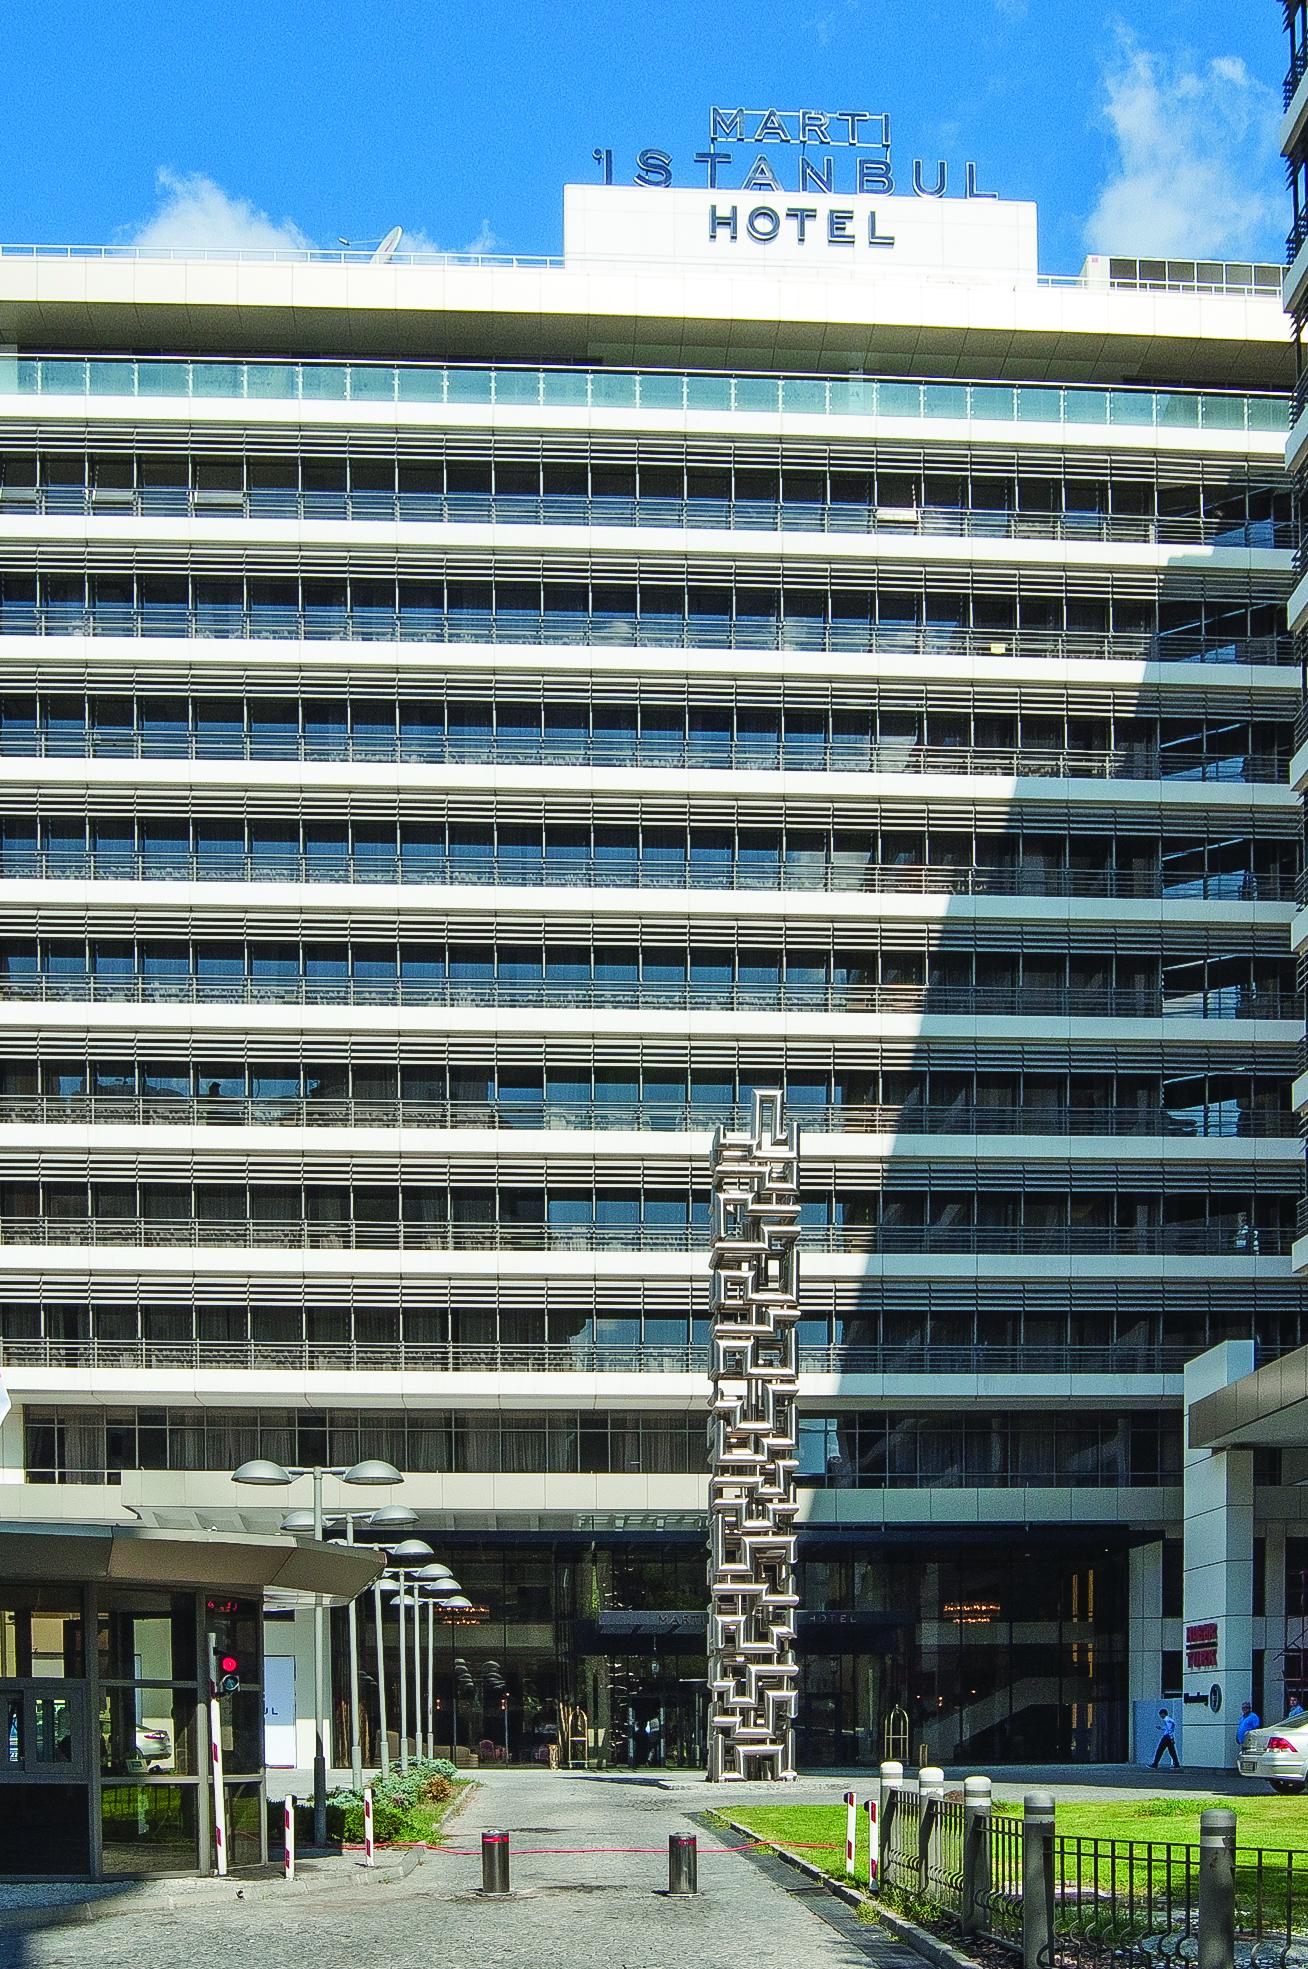 Hotel : Marti Hotel Istanbul